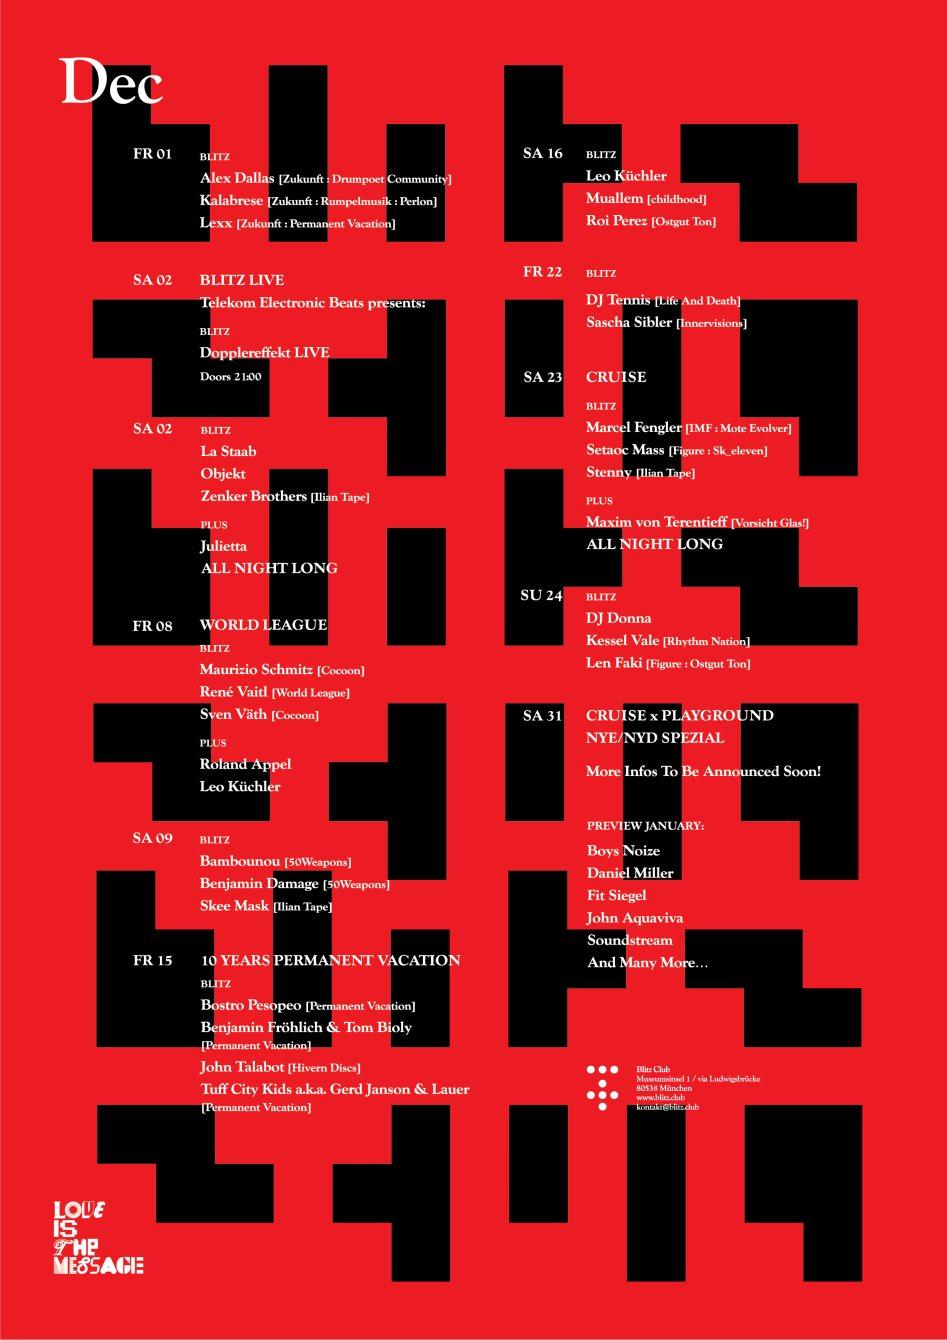 Design Len München ra dj donna kessel vale len faki at blitz munich 2017